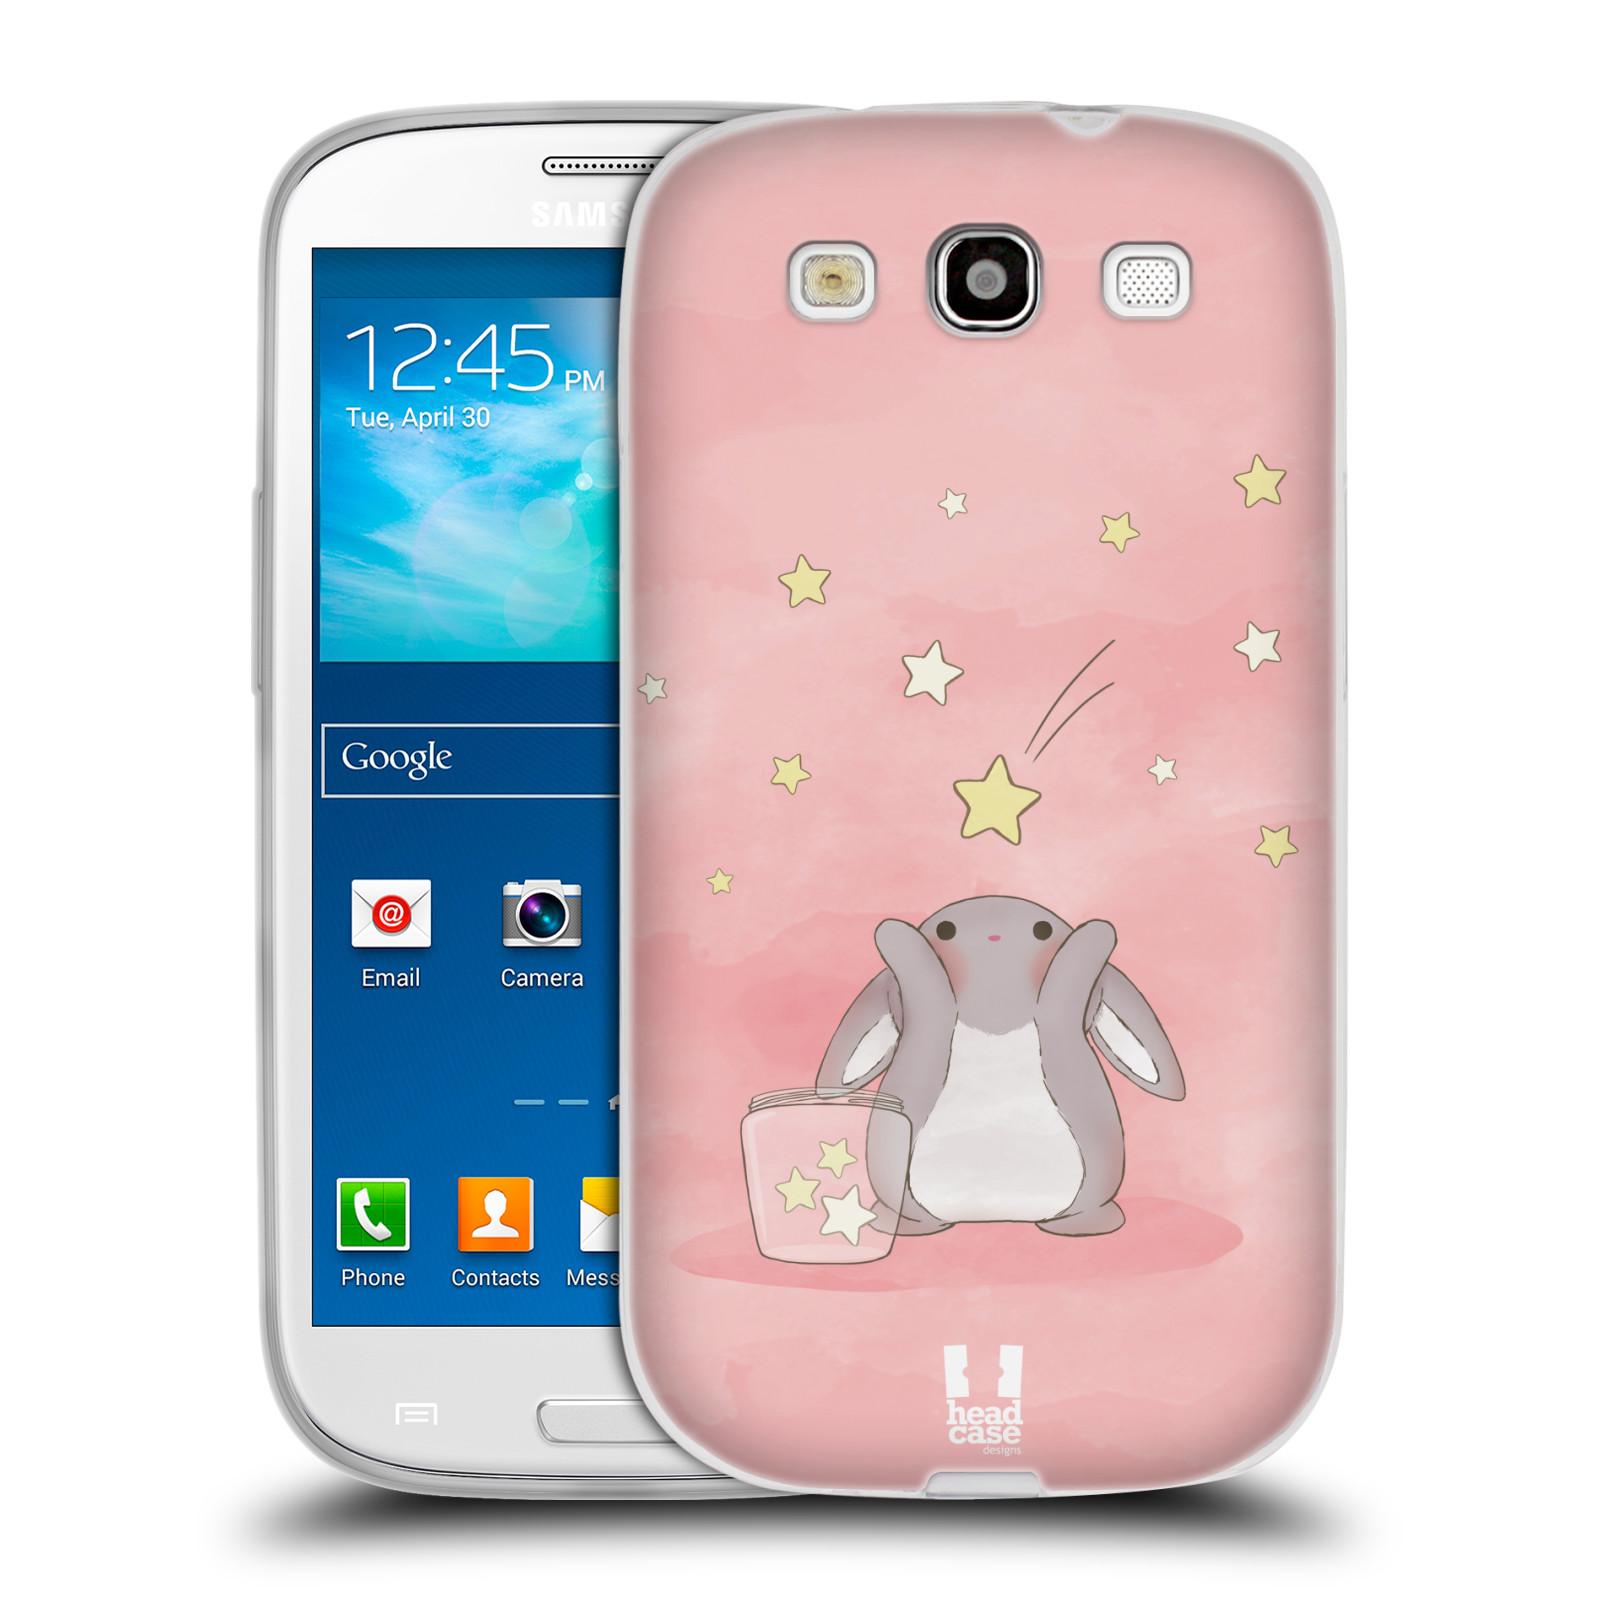 HEAD CASE silikonový obal na mobil Samsung Galaxy S3 i9300 vzor králíček a hvězdy růžová